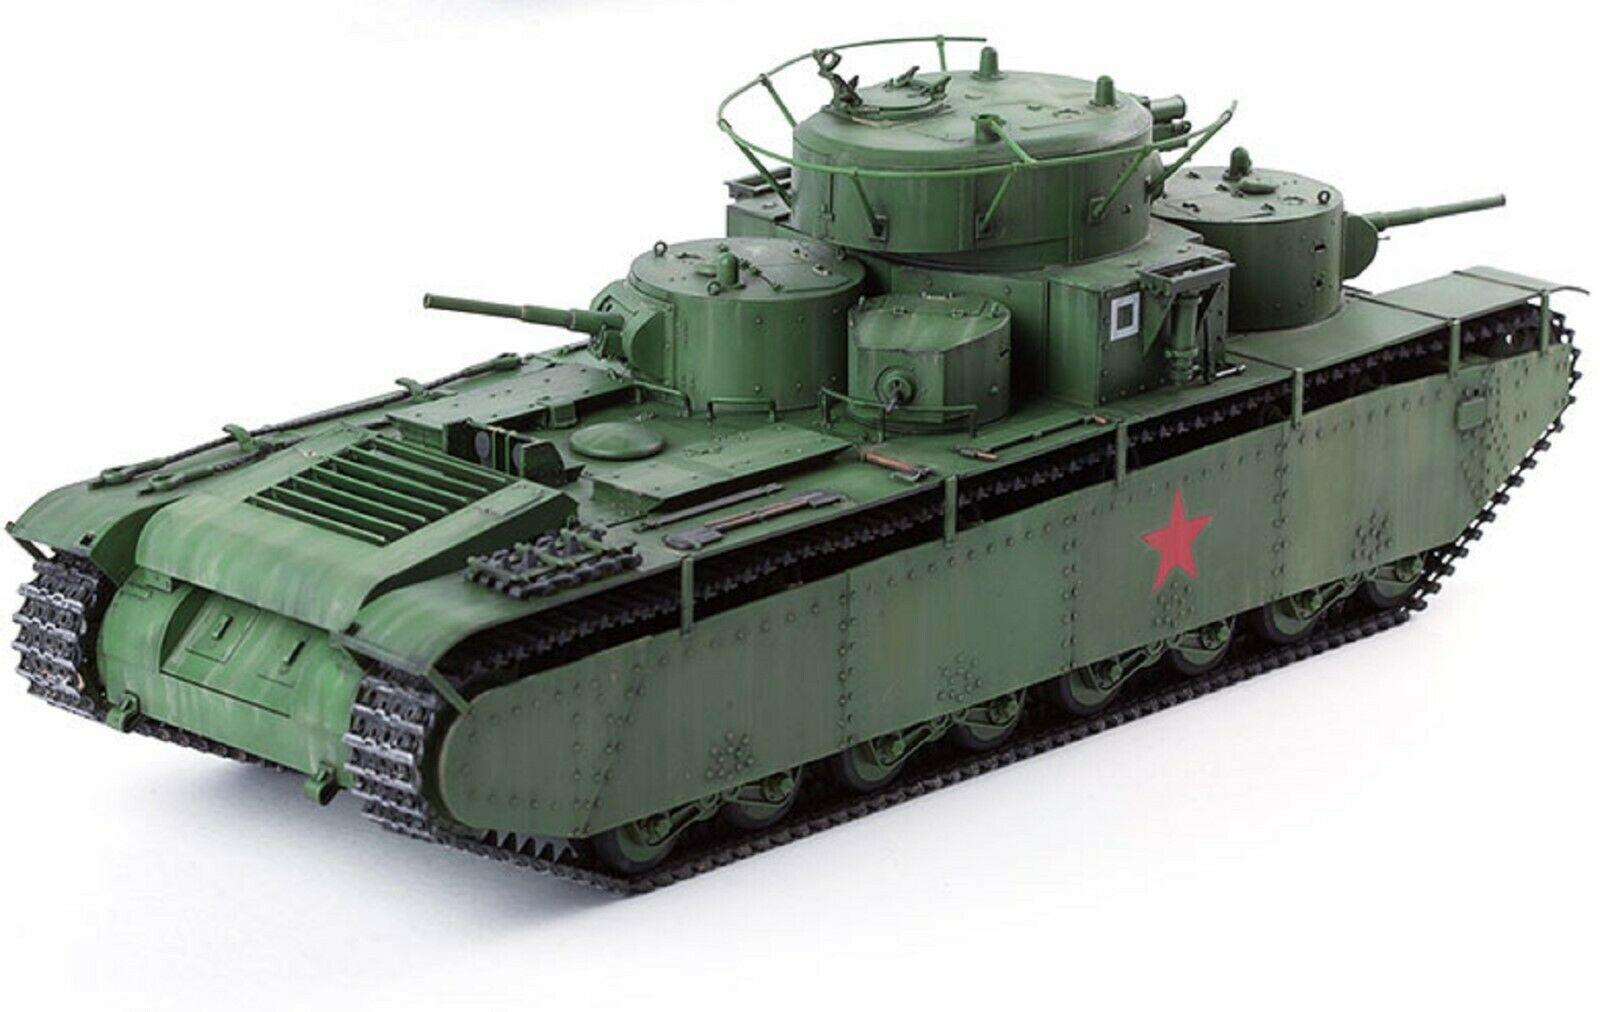 Academy 13517 1:35 Soviet Union T-35 Soviet Heavy Tank Plastic Hobby Model